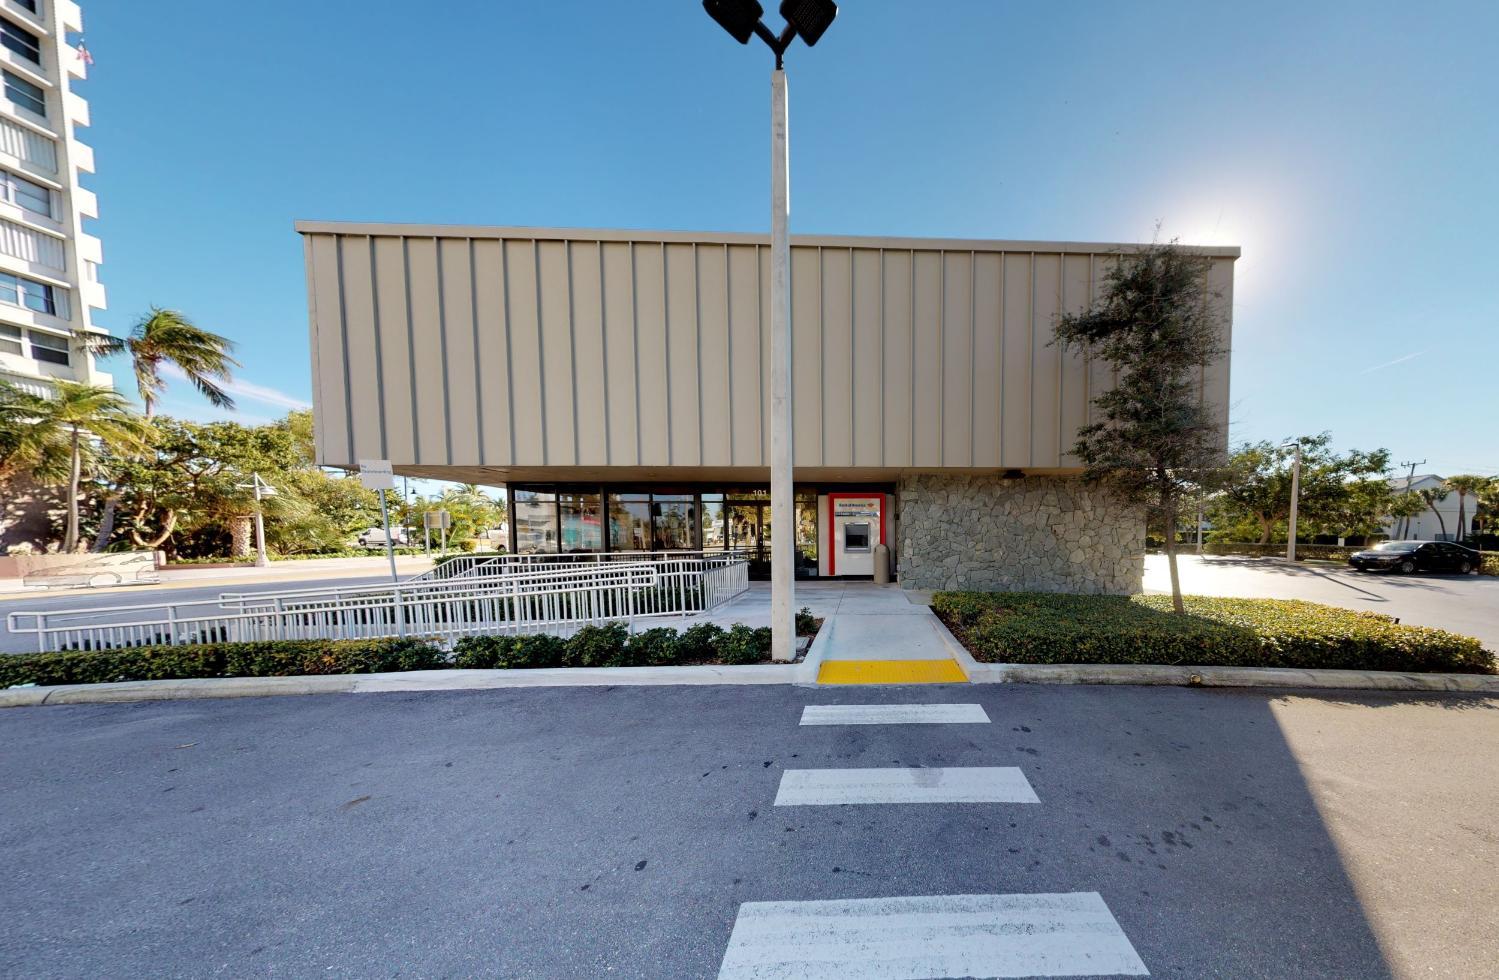 Bank of America financial center with drive-thru ATM   101 S Ocean Blvd, Pompano Beach, FL 33062